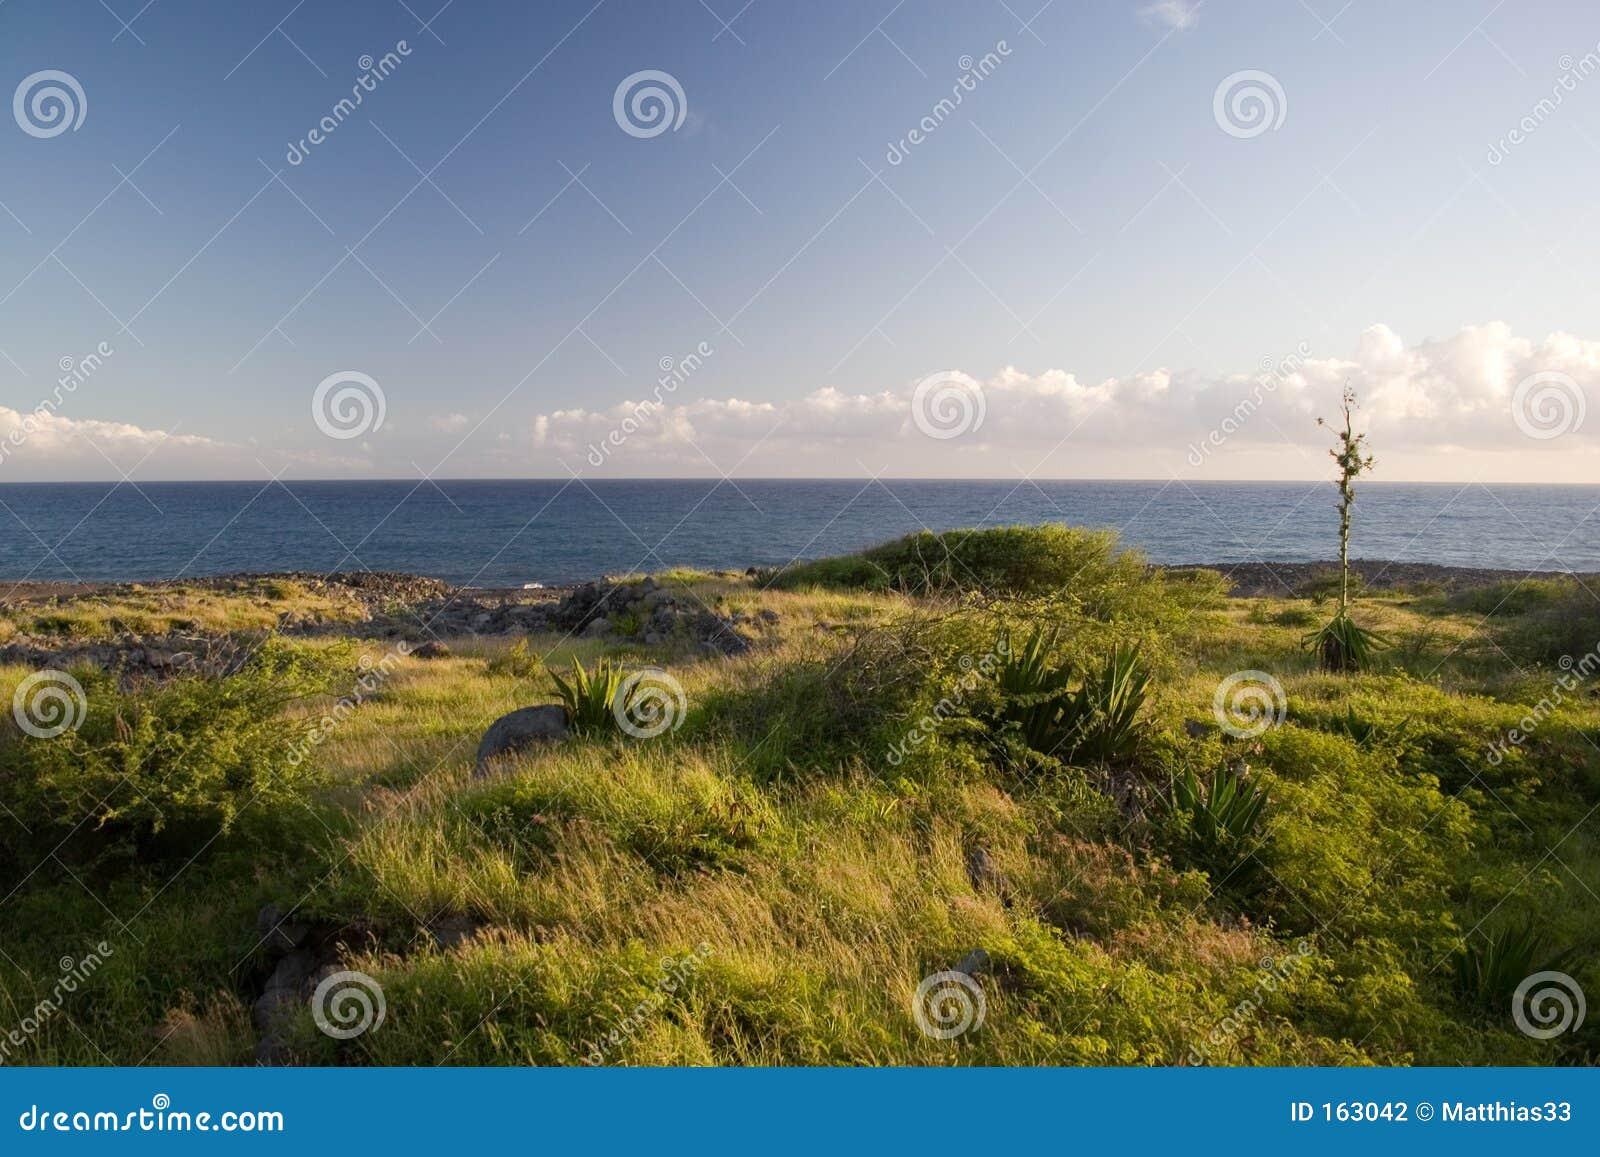 Ocean greenery